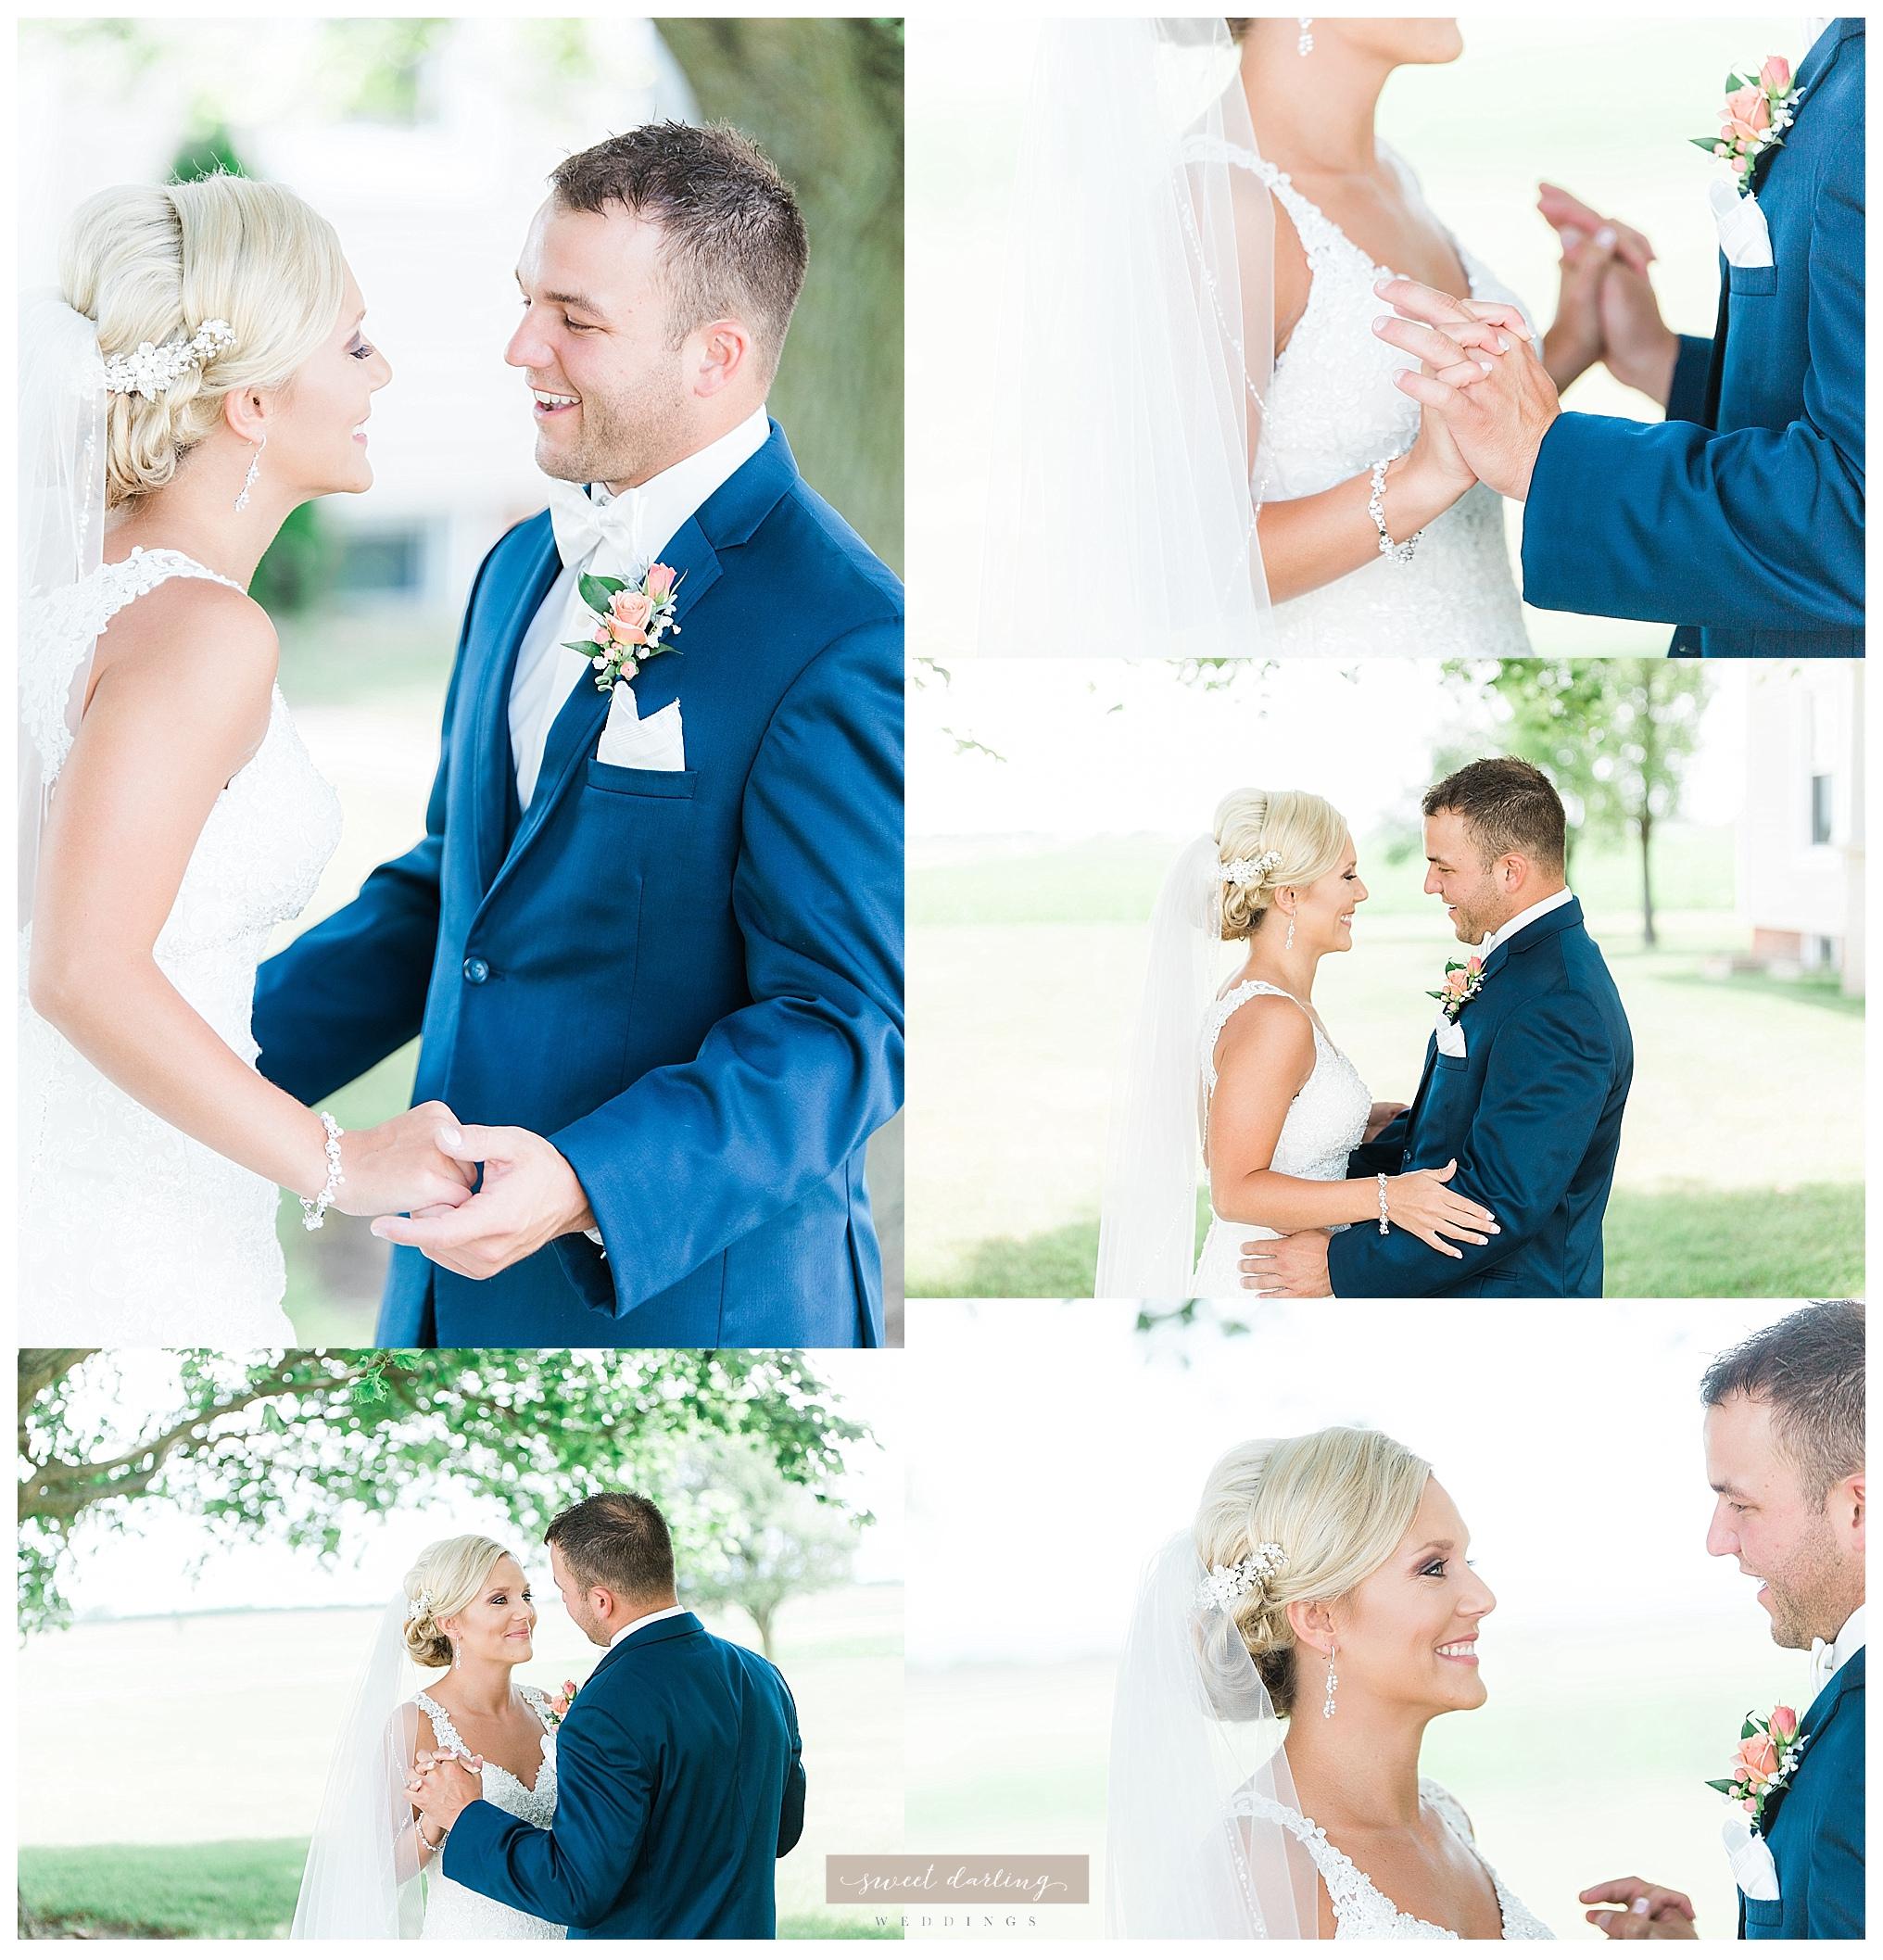 Paxton-illinois-engelbrecht-farmstead-romantic-wedding-photographer-sweet-darling-weddings_1213.jpg